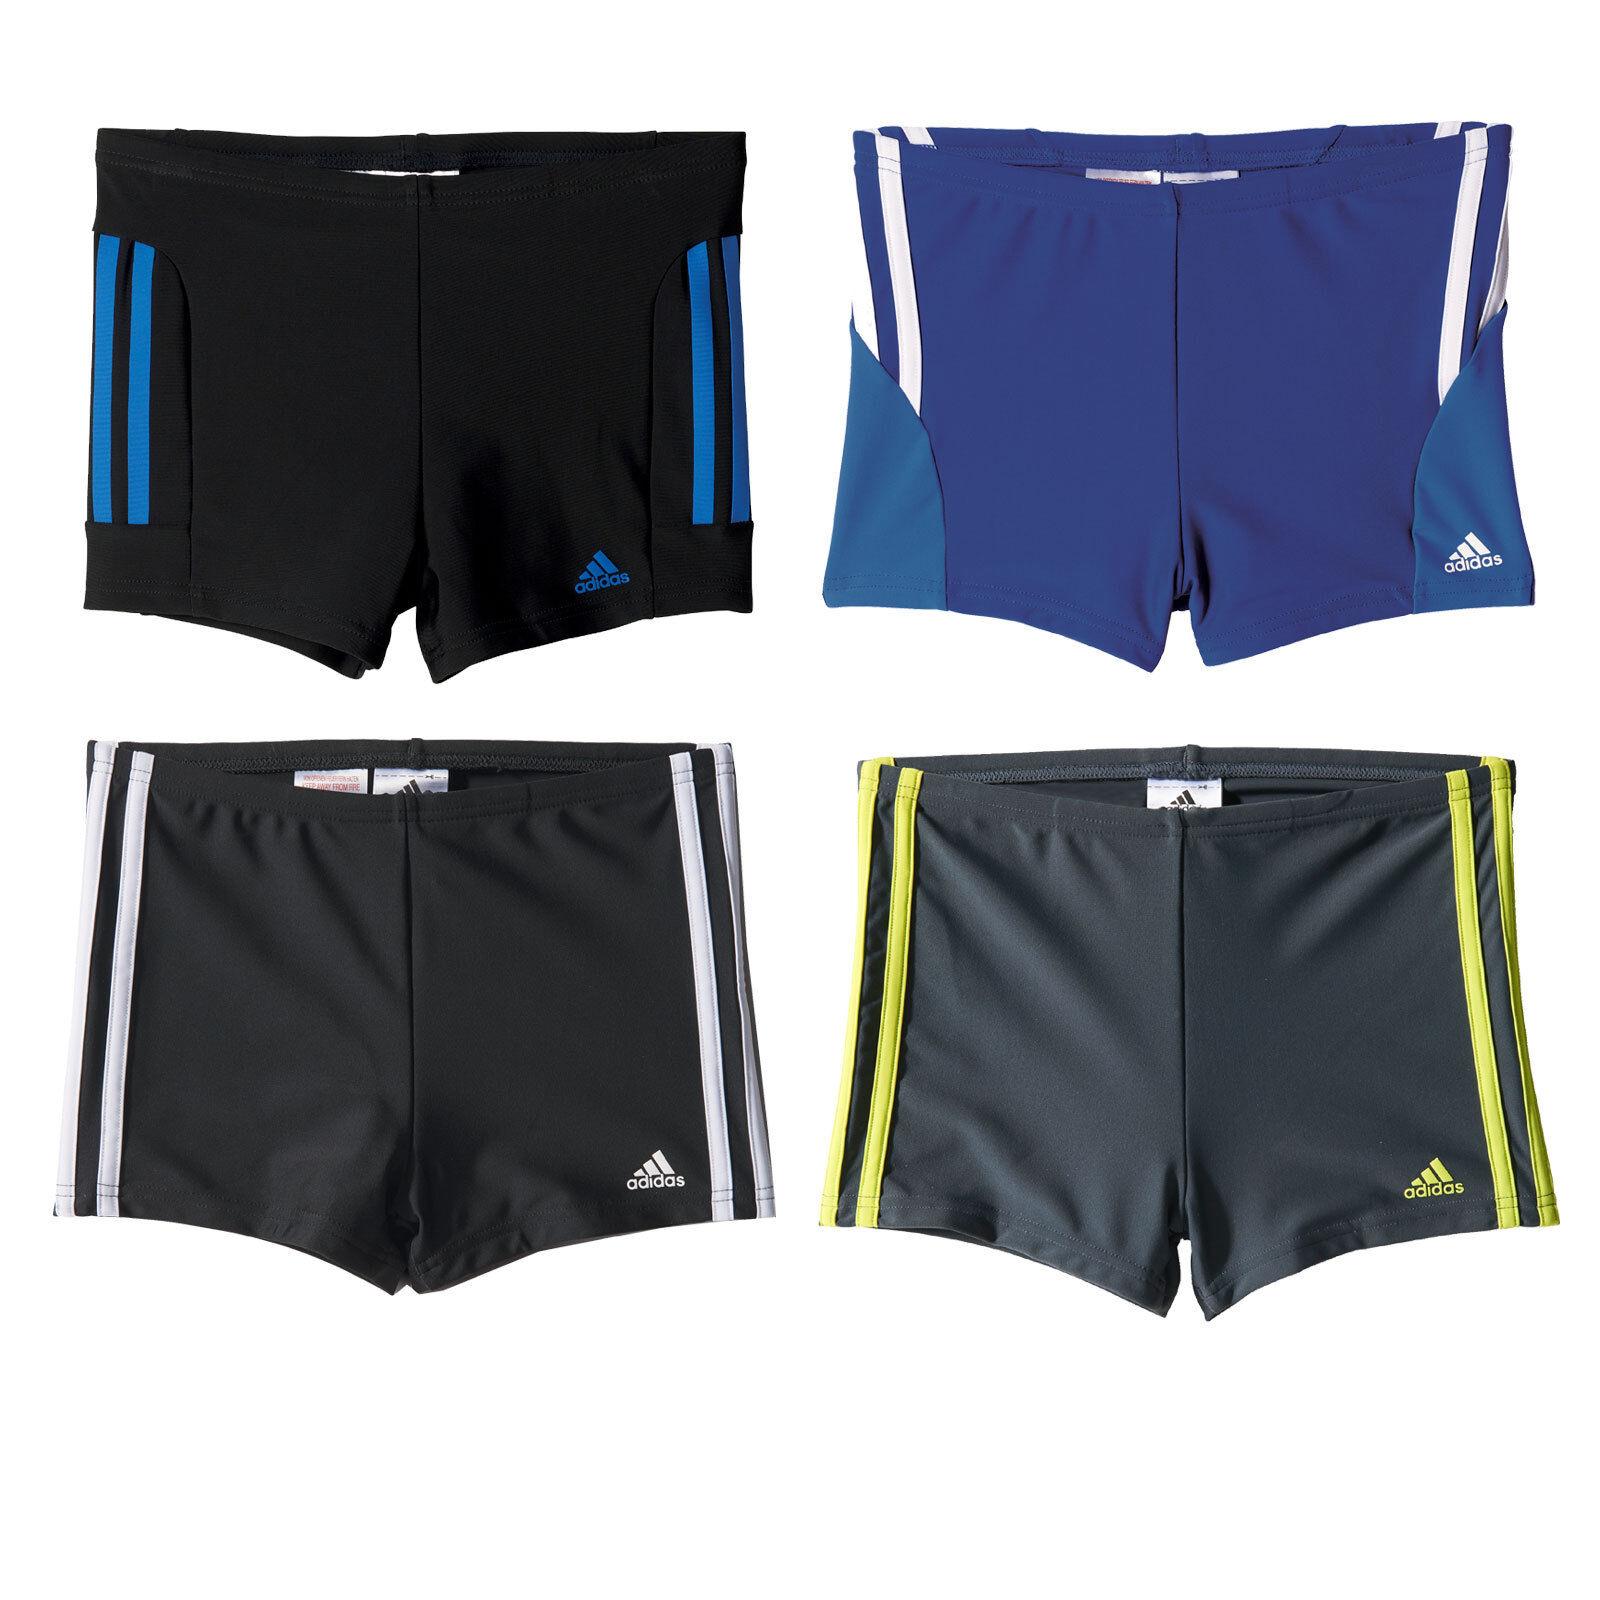 Adidas Boxershorts 164 Test Vergleich +++ Adidas Boxershorts